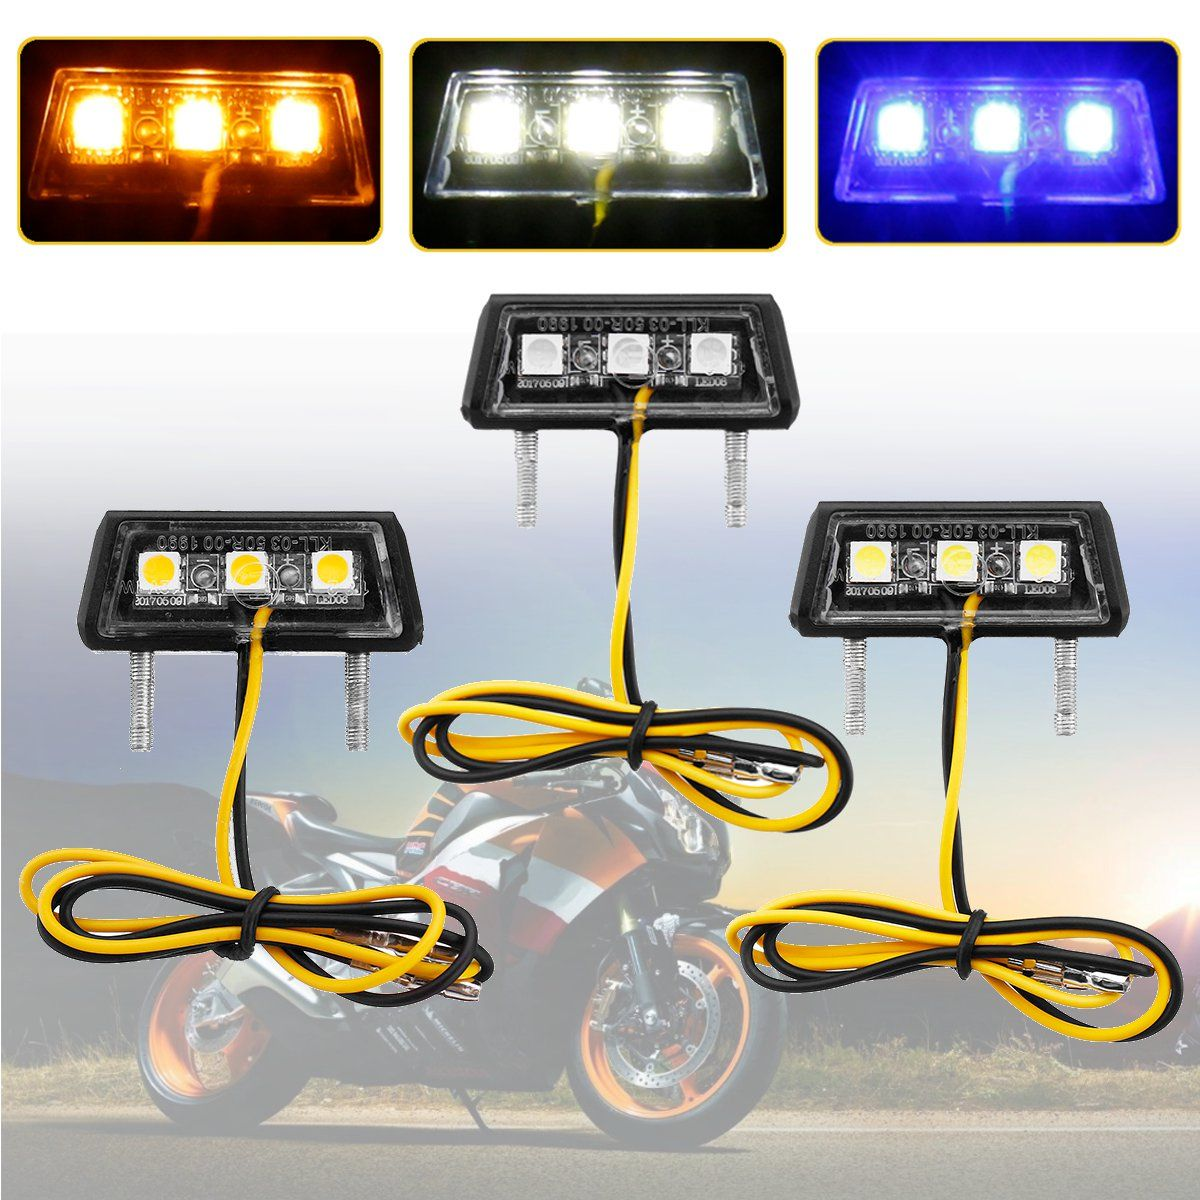 Yellow Blue White Mini Motorcycle Motorbike LED Tail Rear Light License Plate Light For Honda for Kawasaki for Yamaha for Suzuki